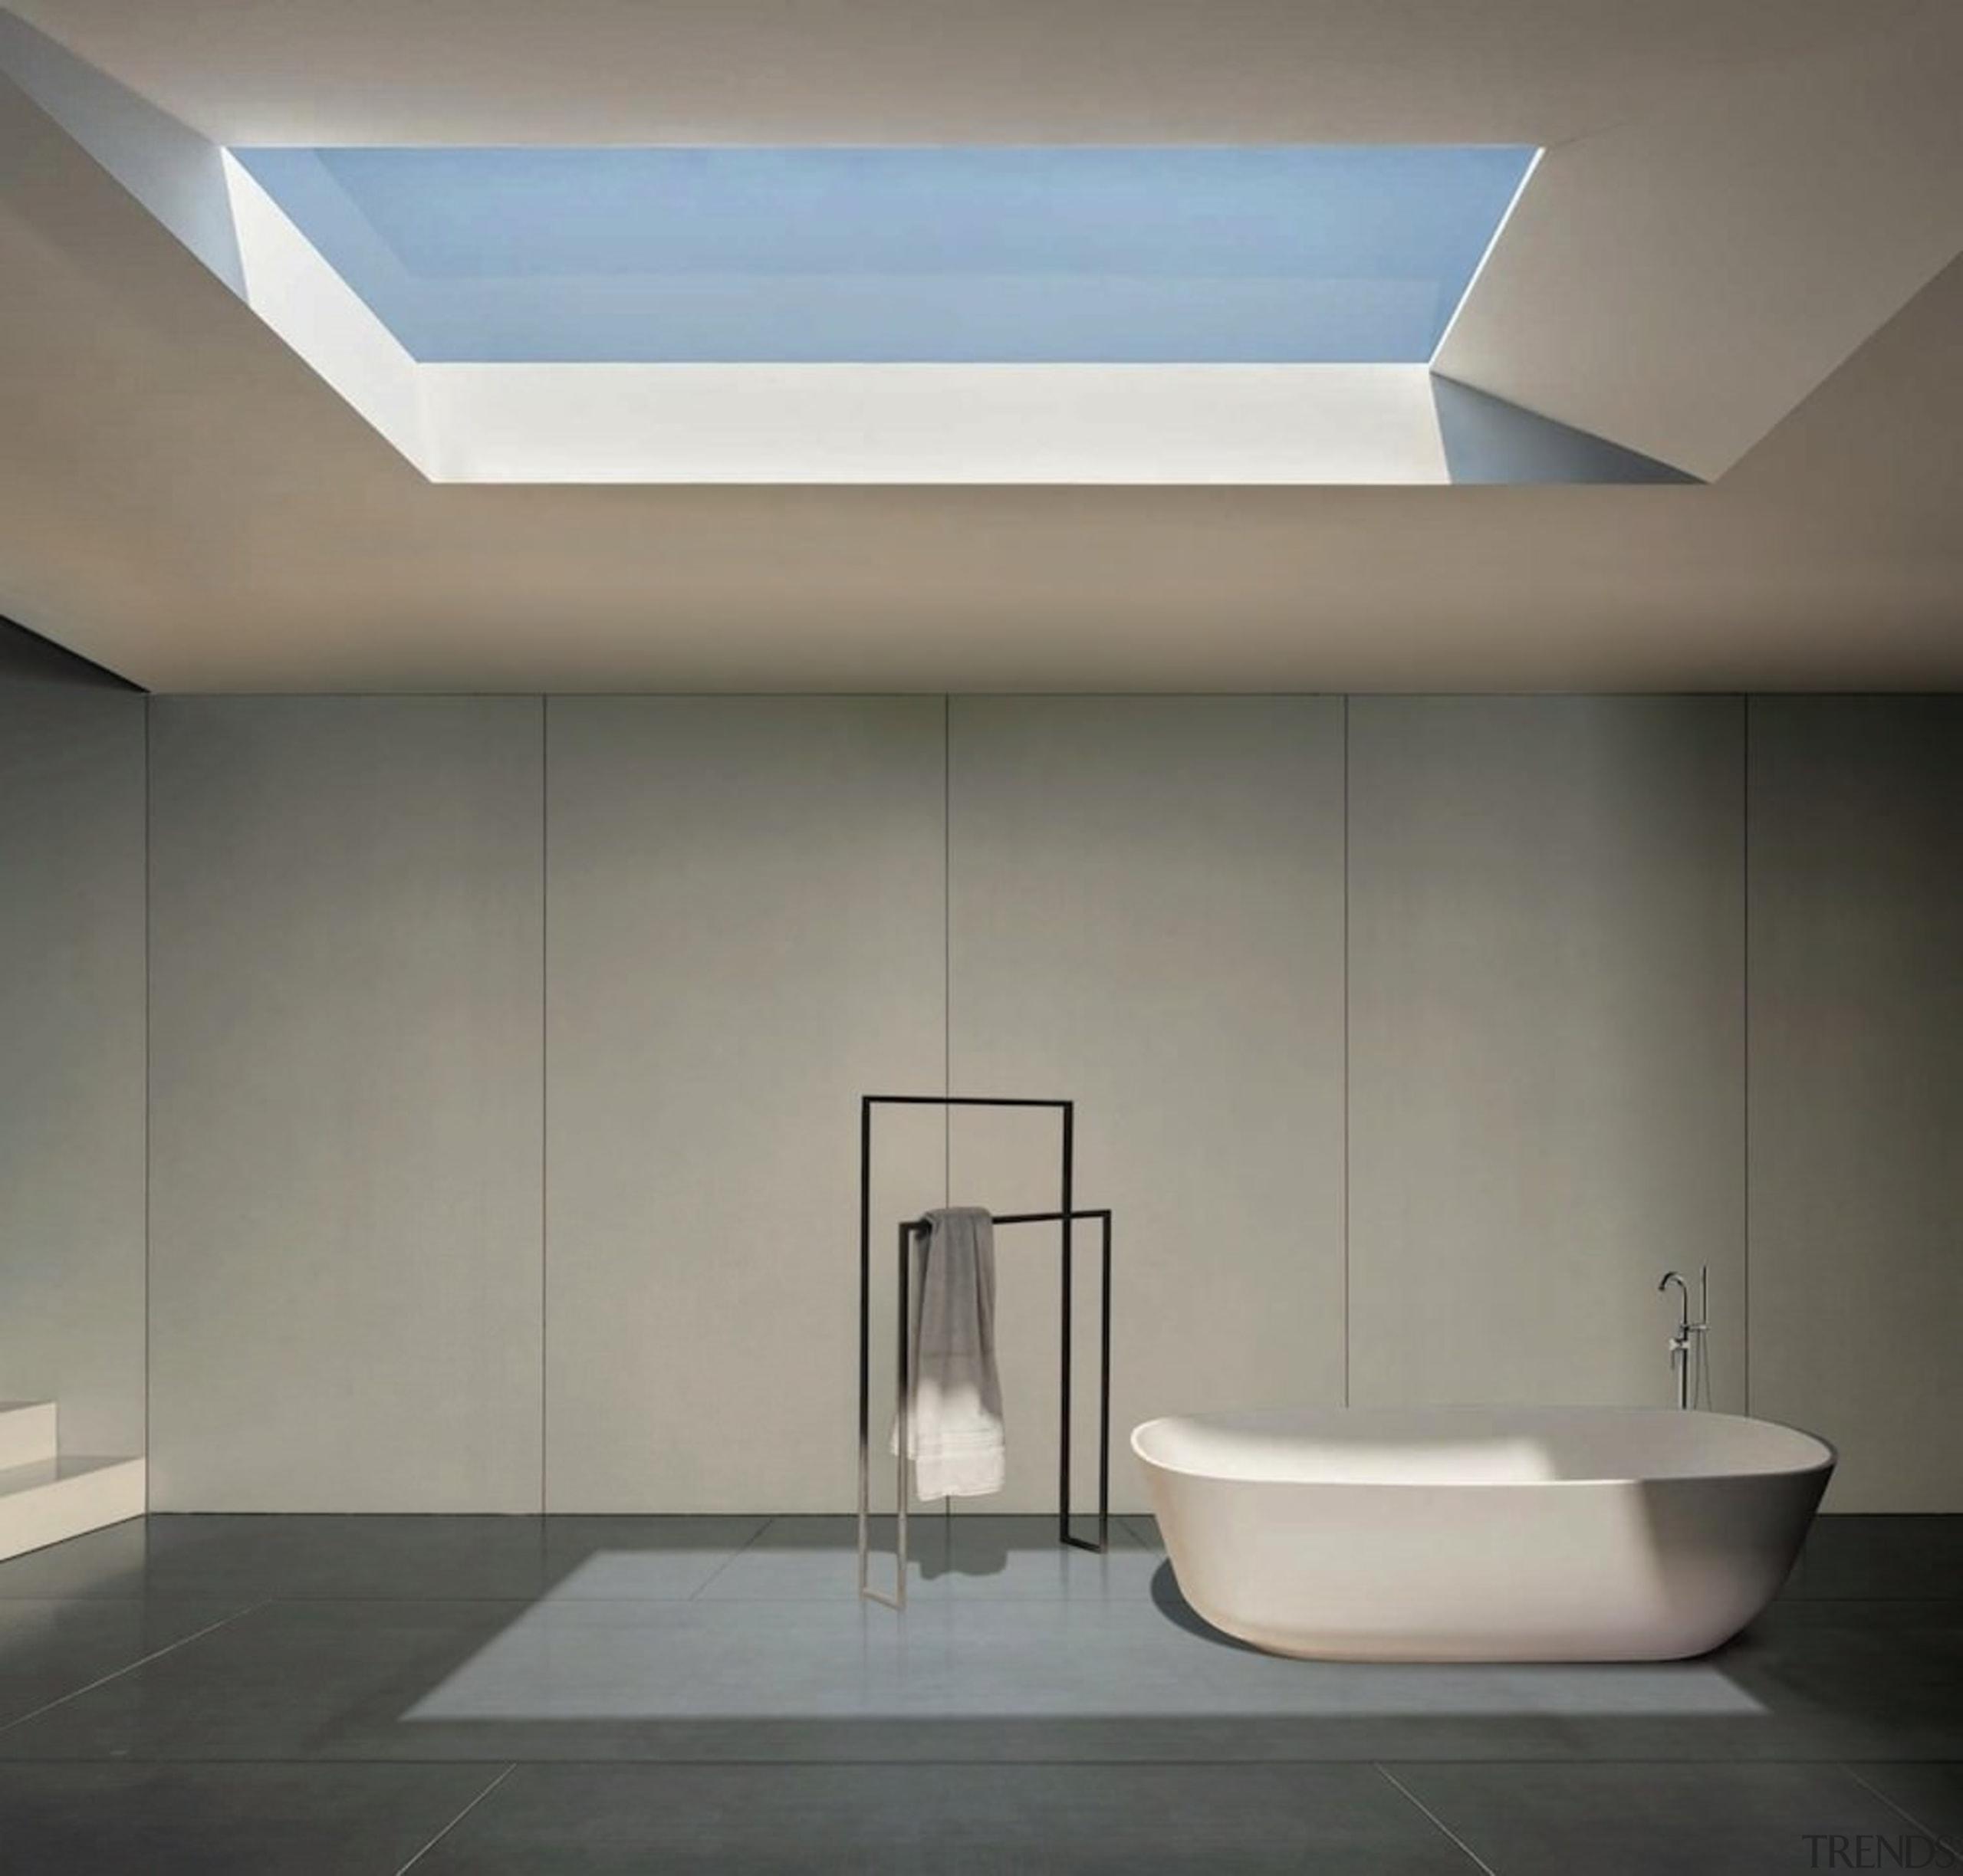 Like minimalism? This bathroom is like the set angle, architecture, bathroom, ceiling, daylighting, daytime, floor, interior design, lighting, product design, tap, gray